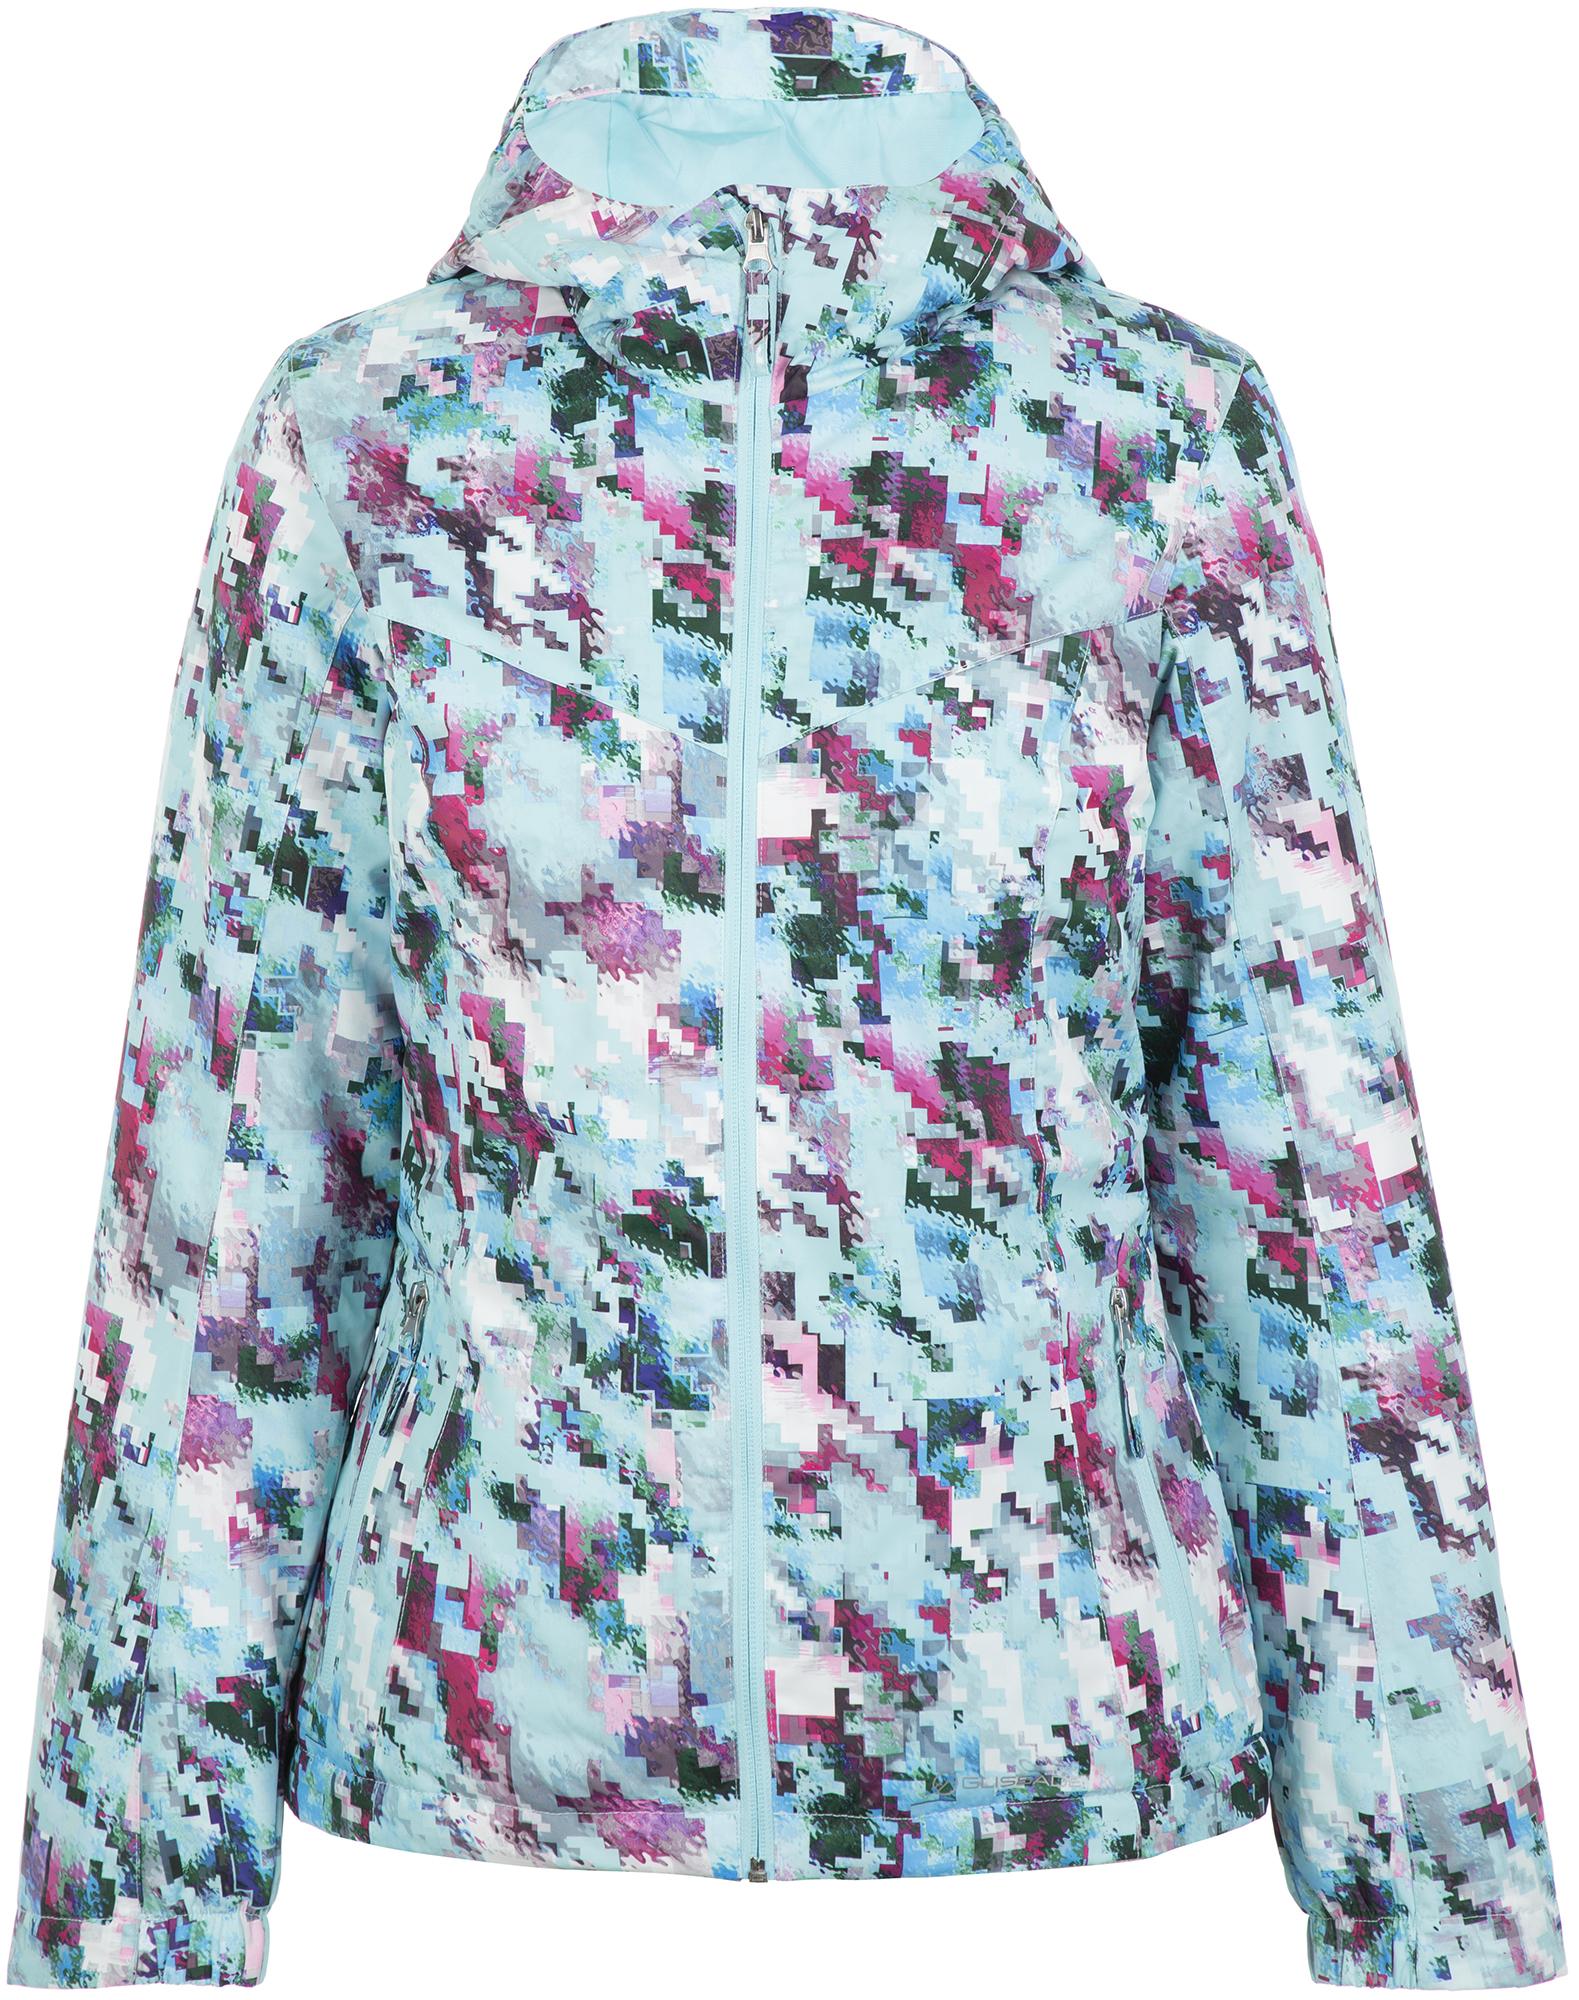 Glissade Куртка утепленная женская Glissade, размер 42 glissade куртка утепленная мужская glissade размер 56 58